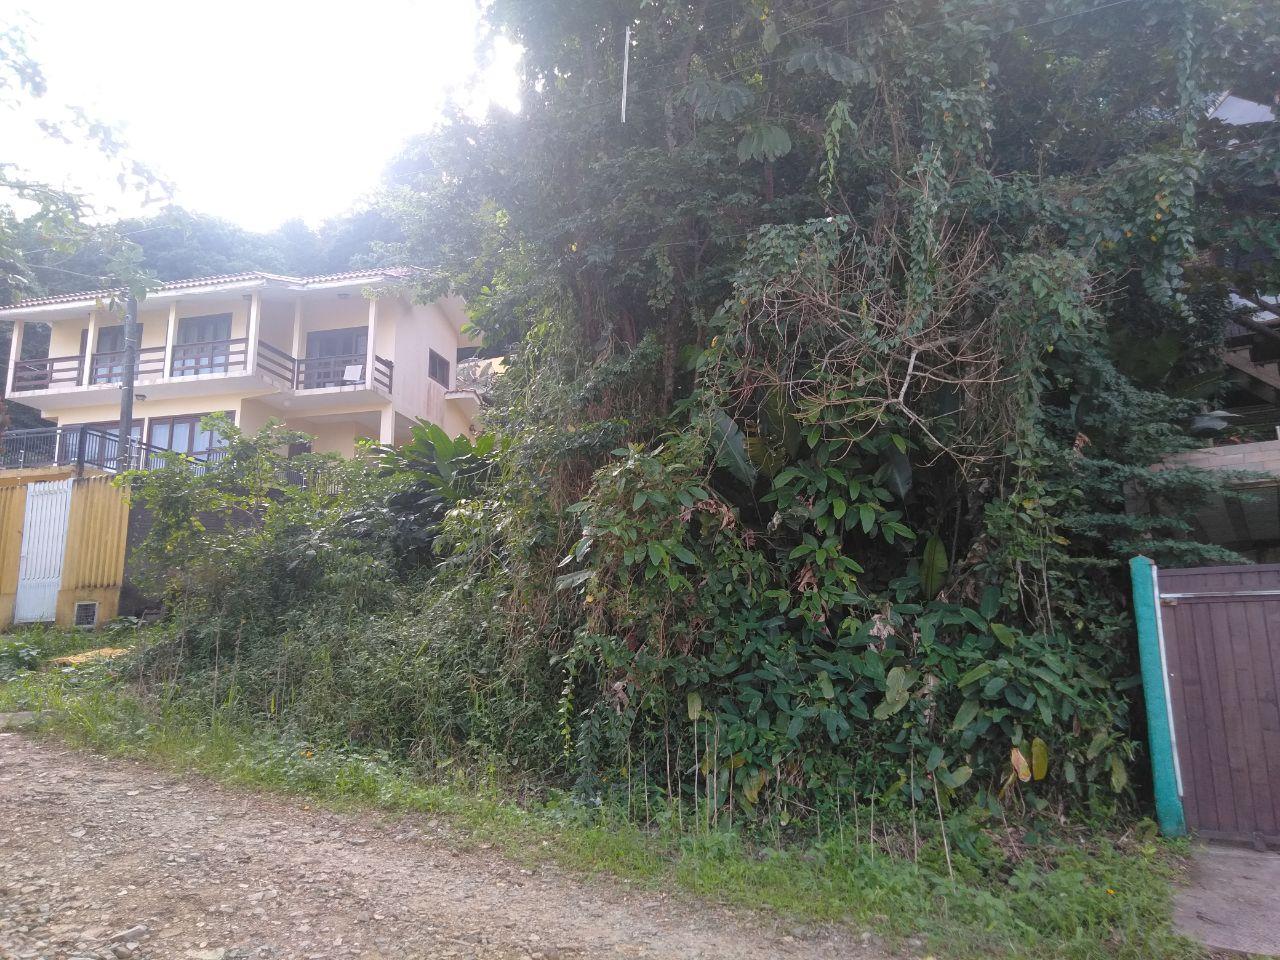 Cadin Imóveis - Venda - Terreno - Centro - Penha - SC - R$195.000,00